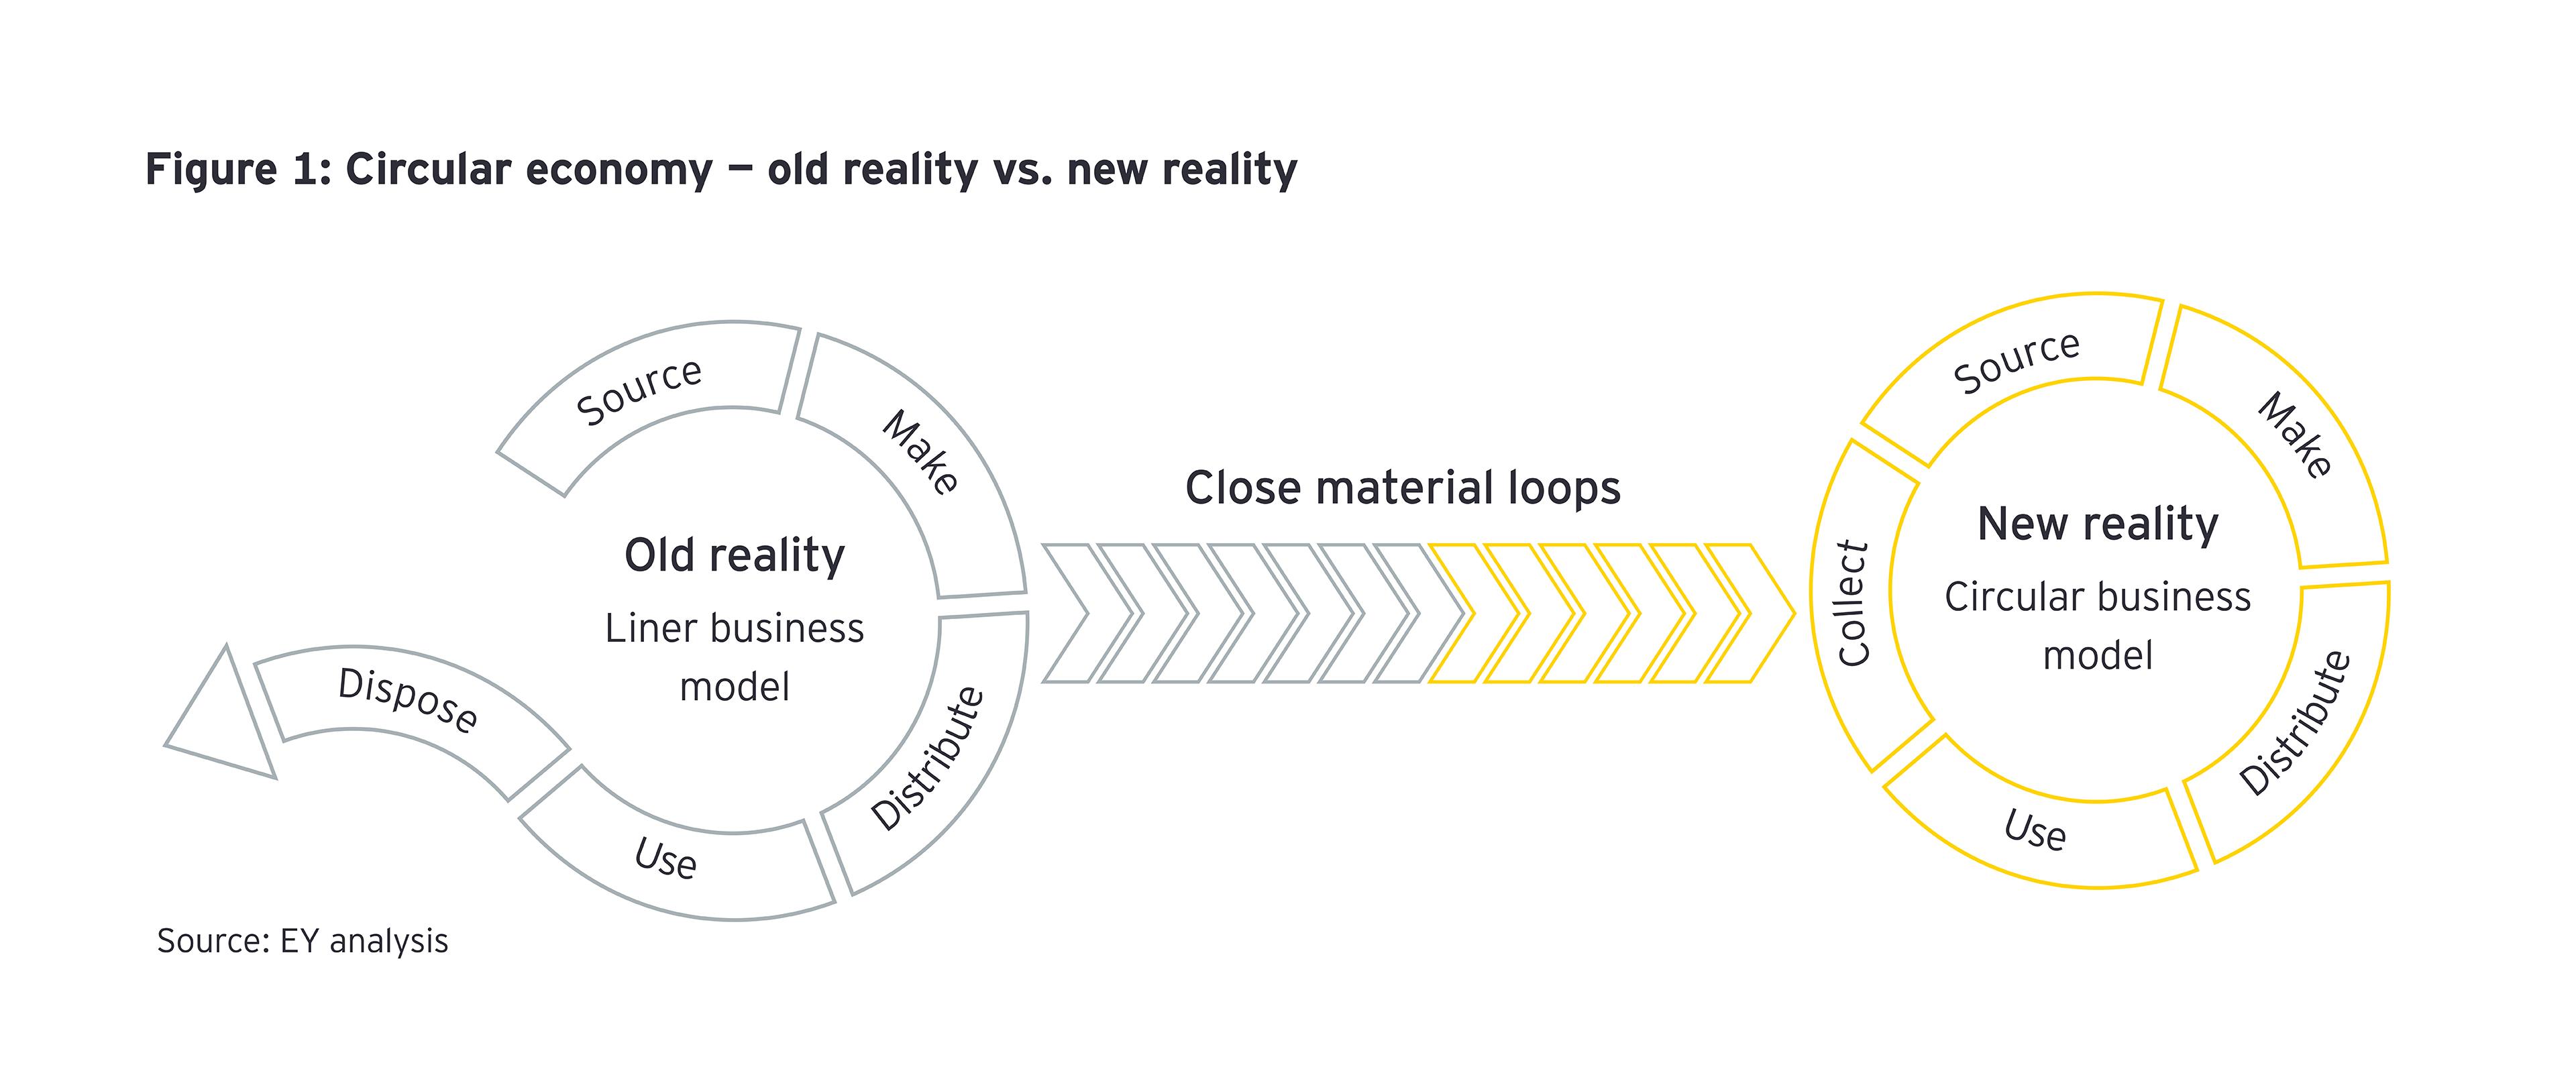 Circular economy - old reality vs new reality